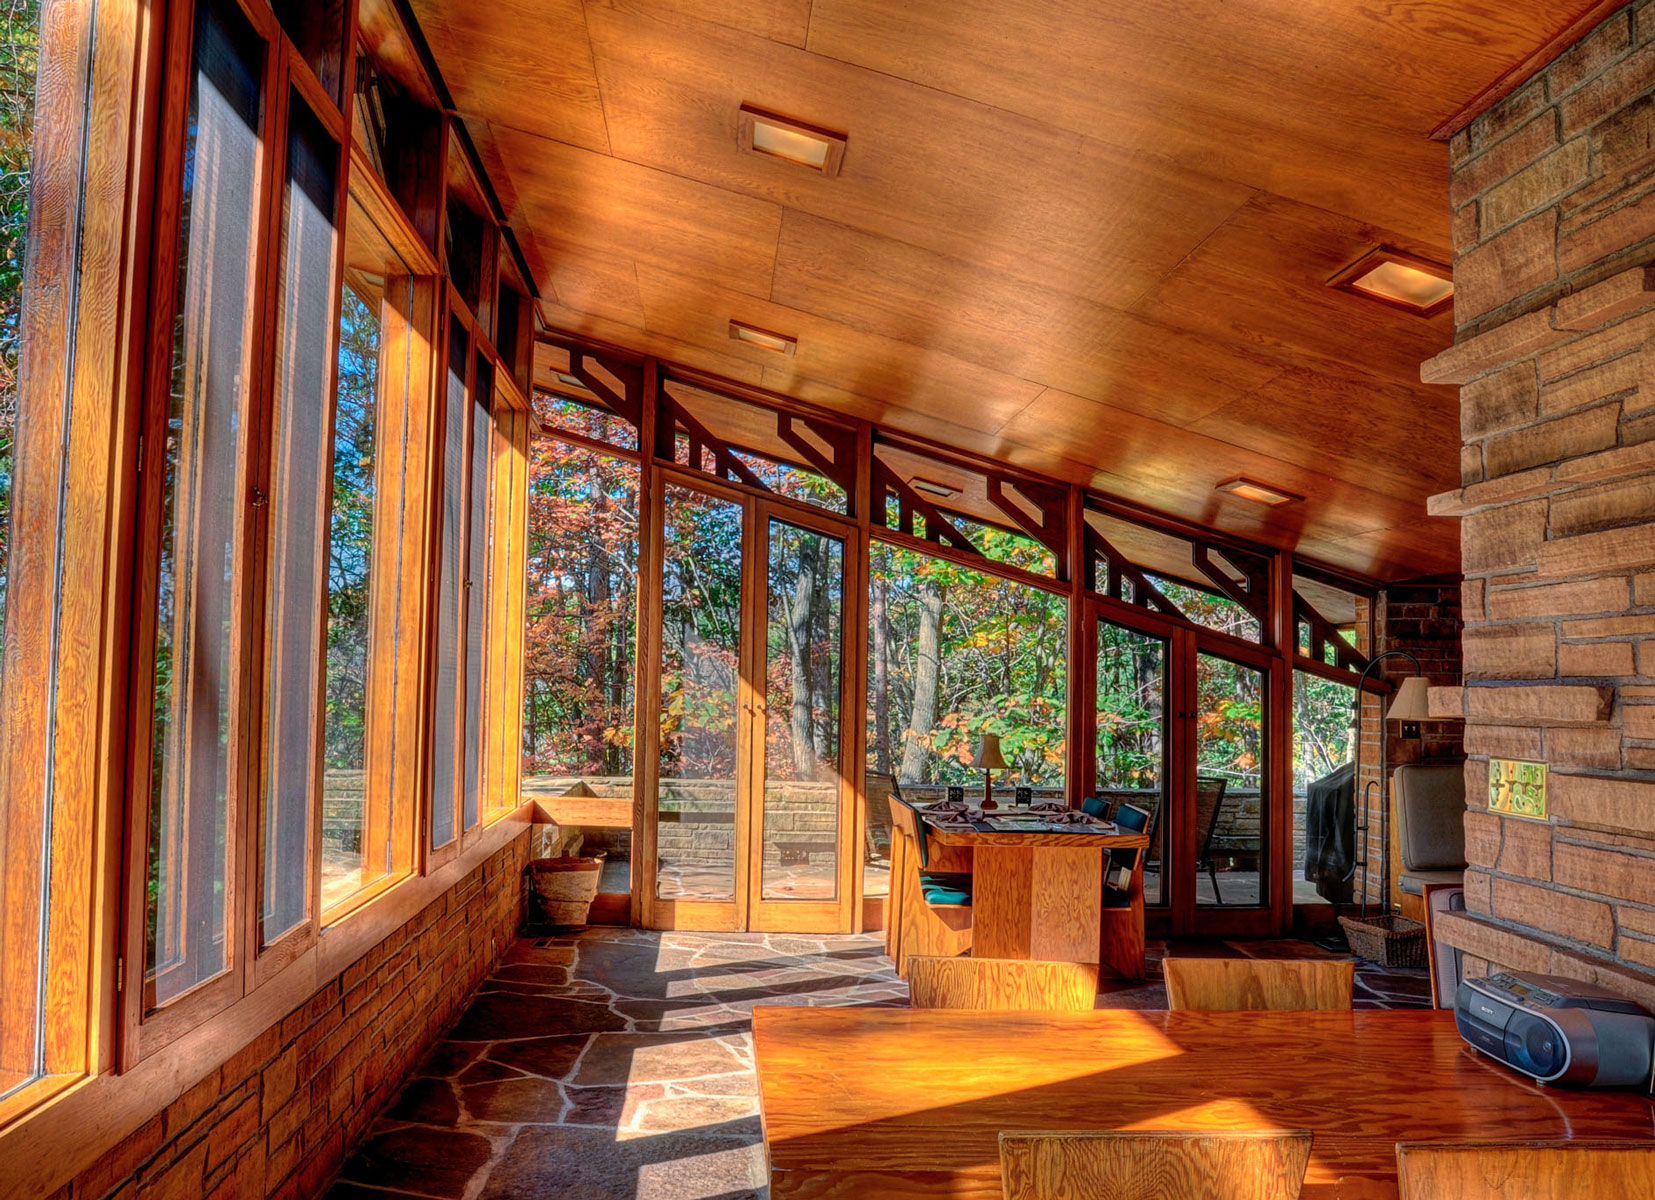 Seth Peterson Cottage interior